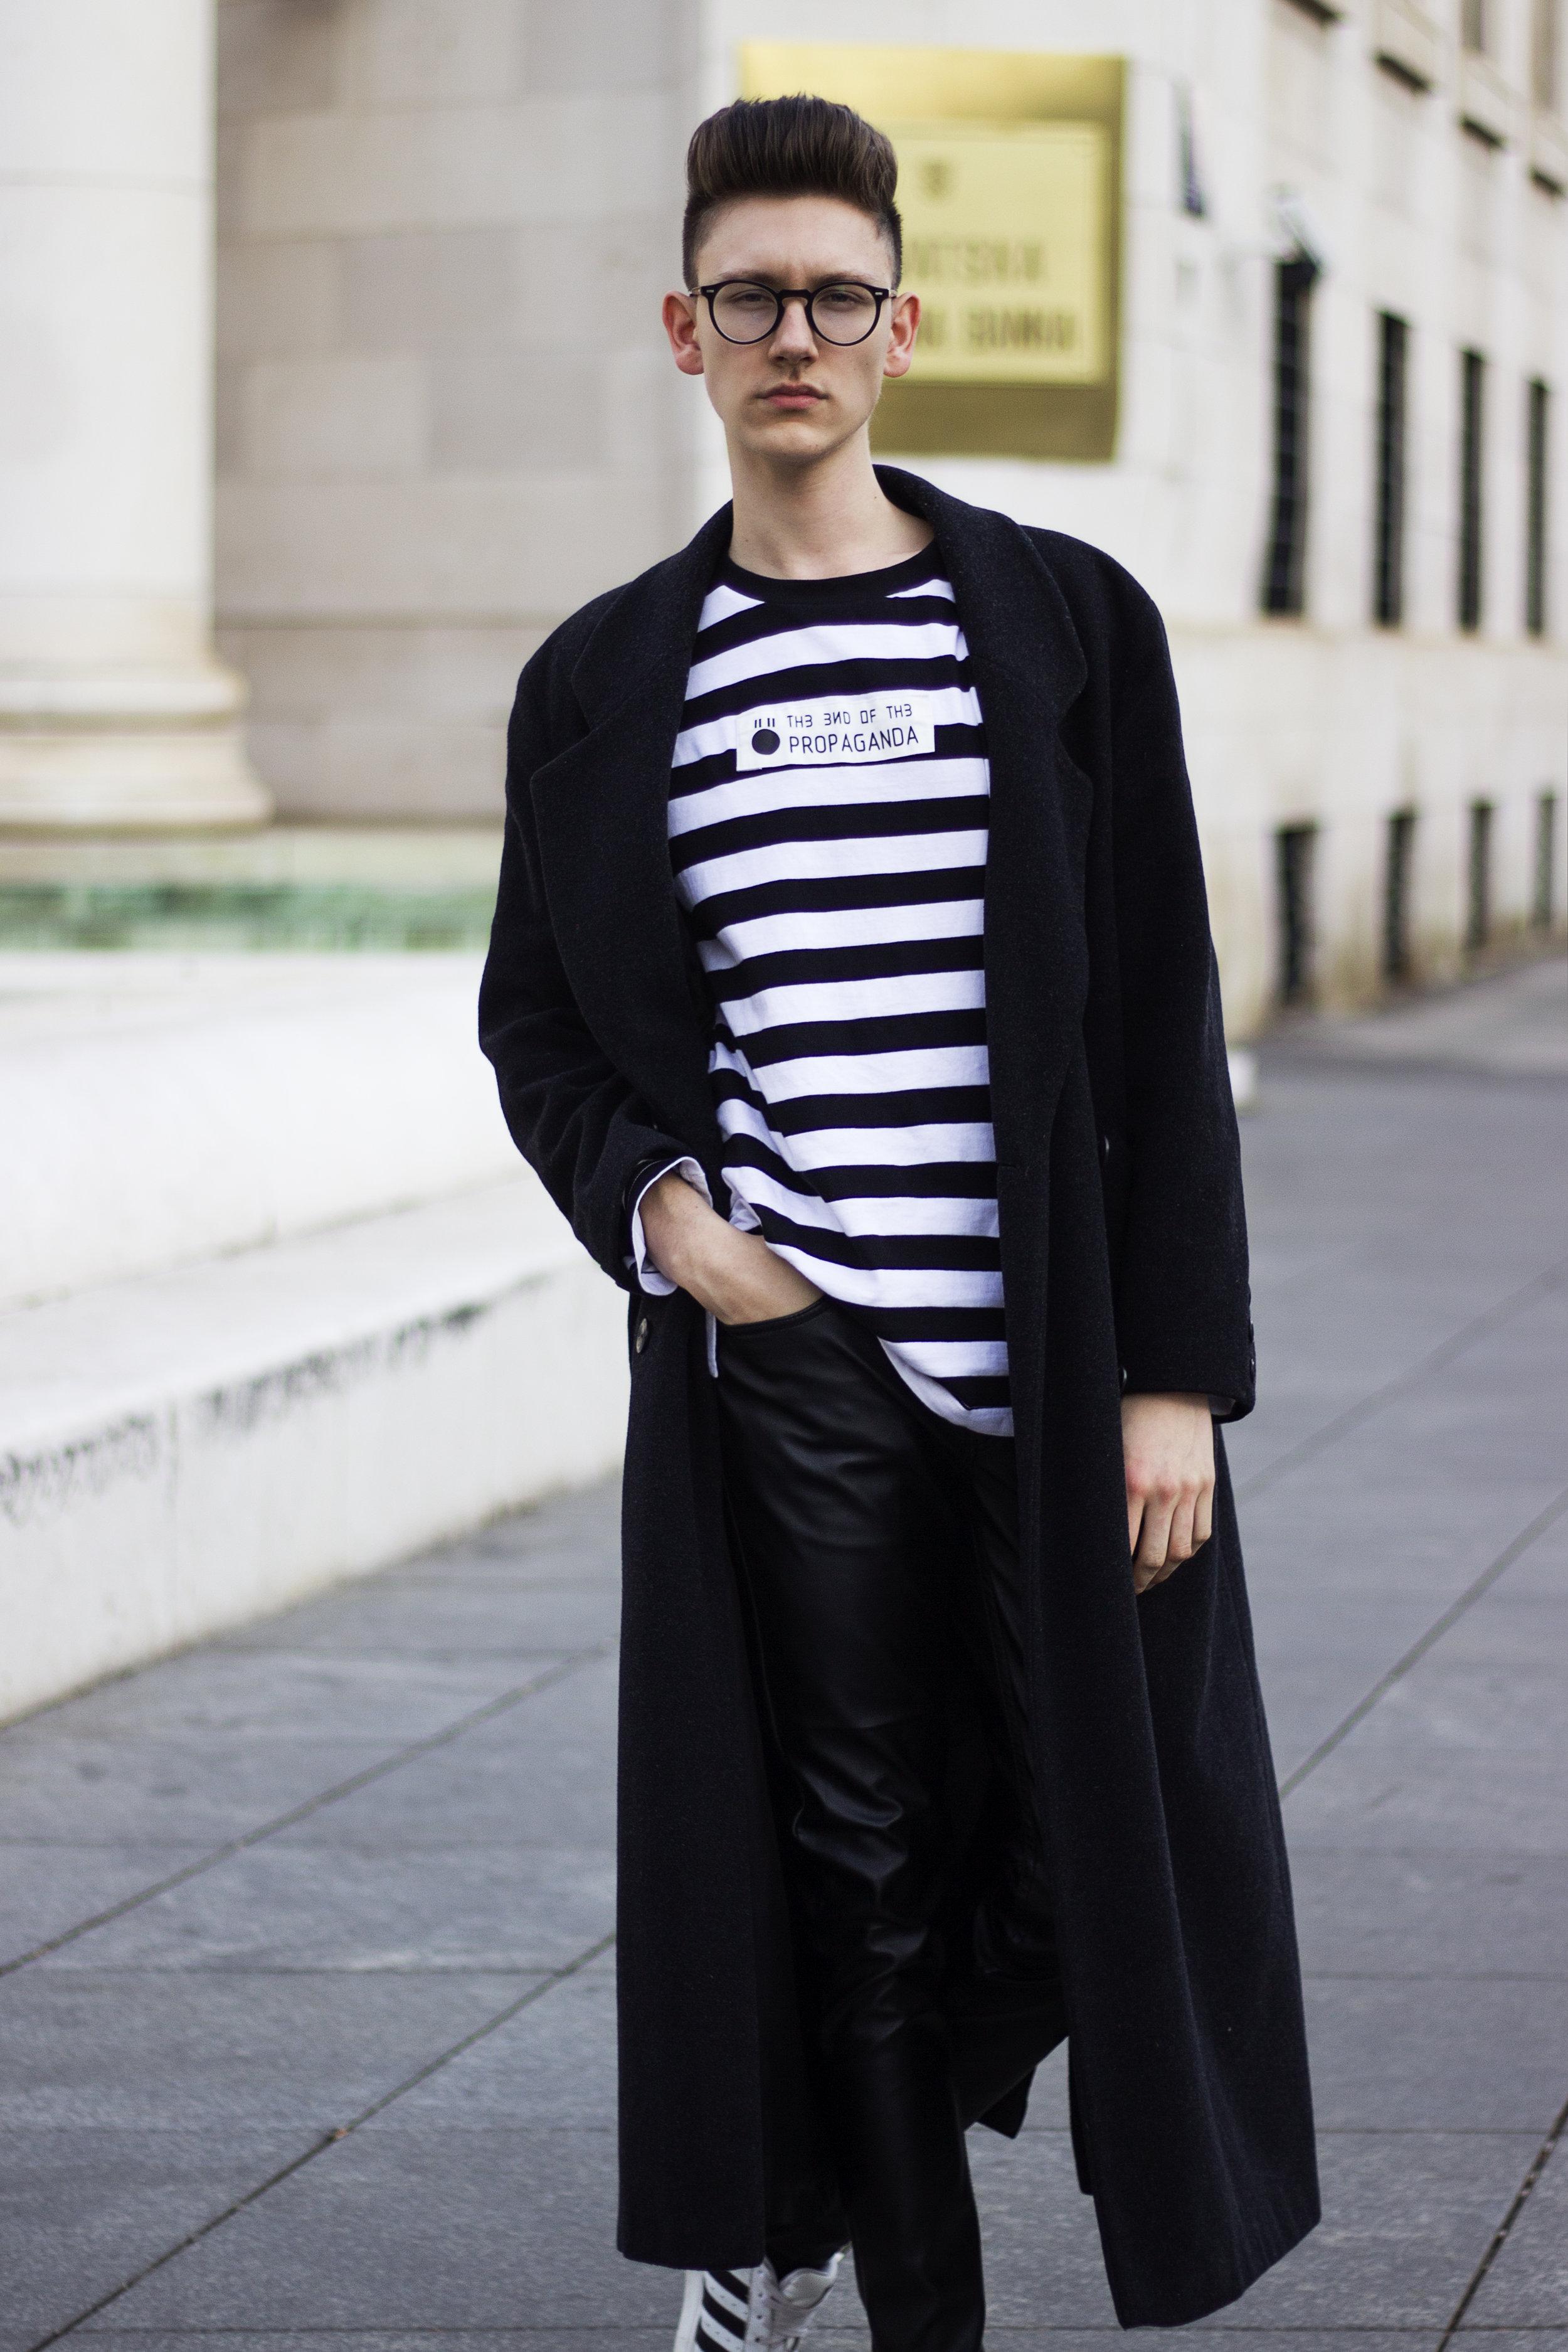 luka-lajic-expensive-reality-hm-mens-fashion-croatia-blogger (3).jpg